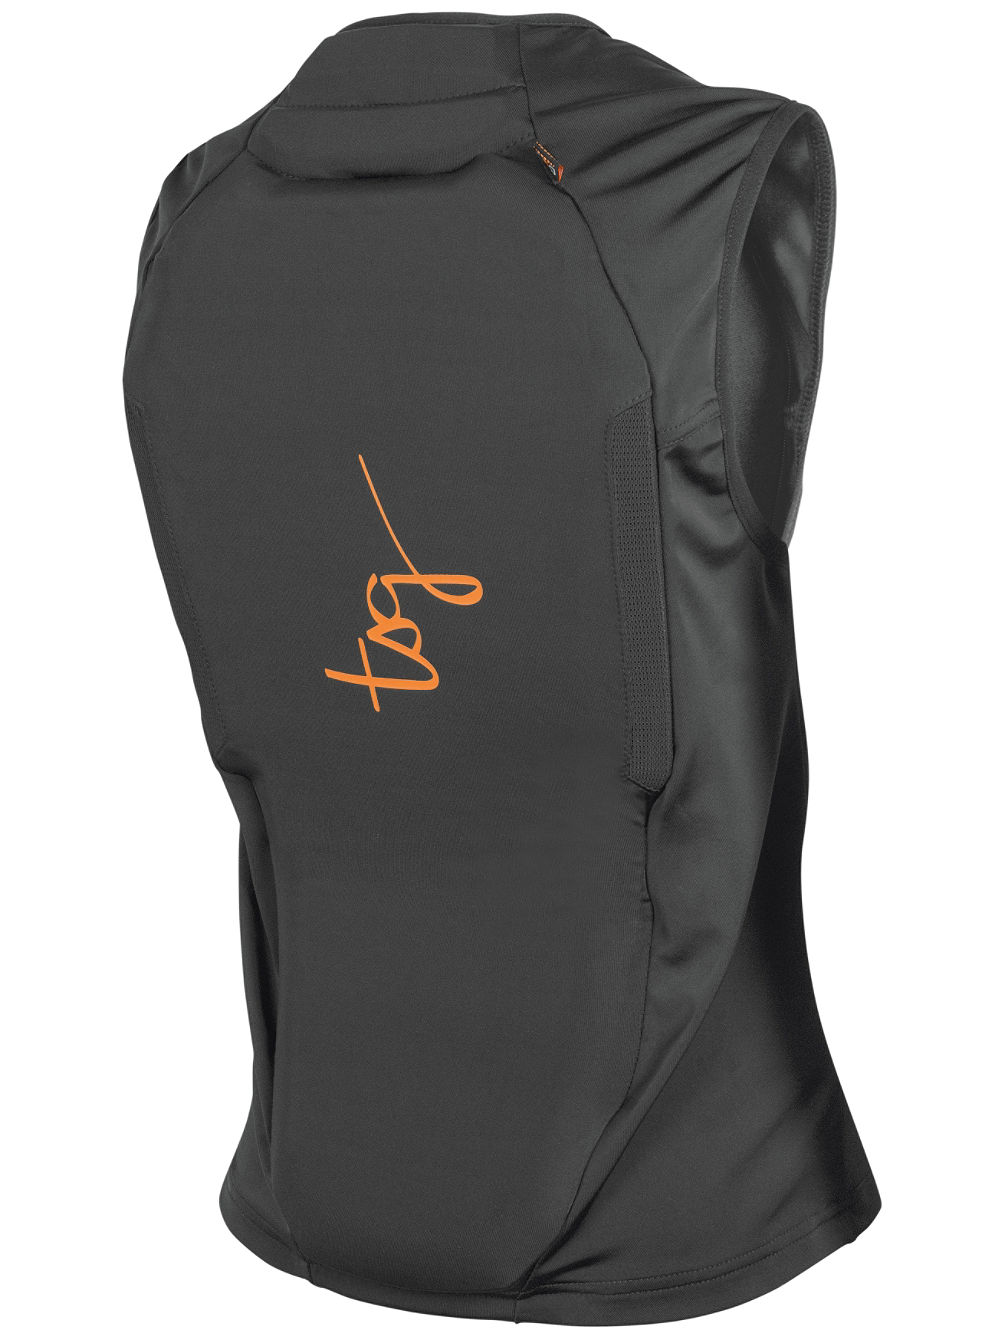 Buy TSG Backbone Vest D3O online at blue-tomato.com 7bfa71d24